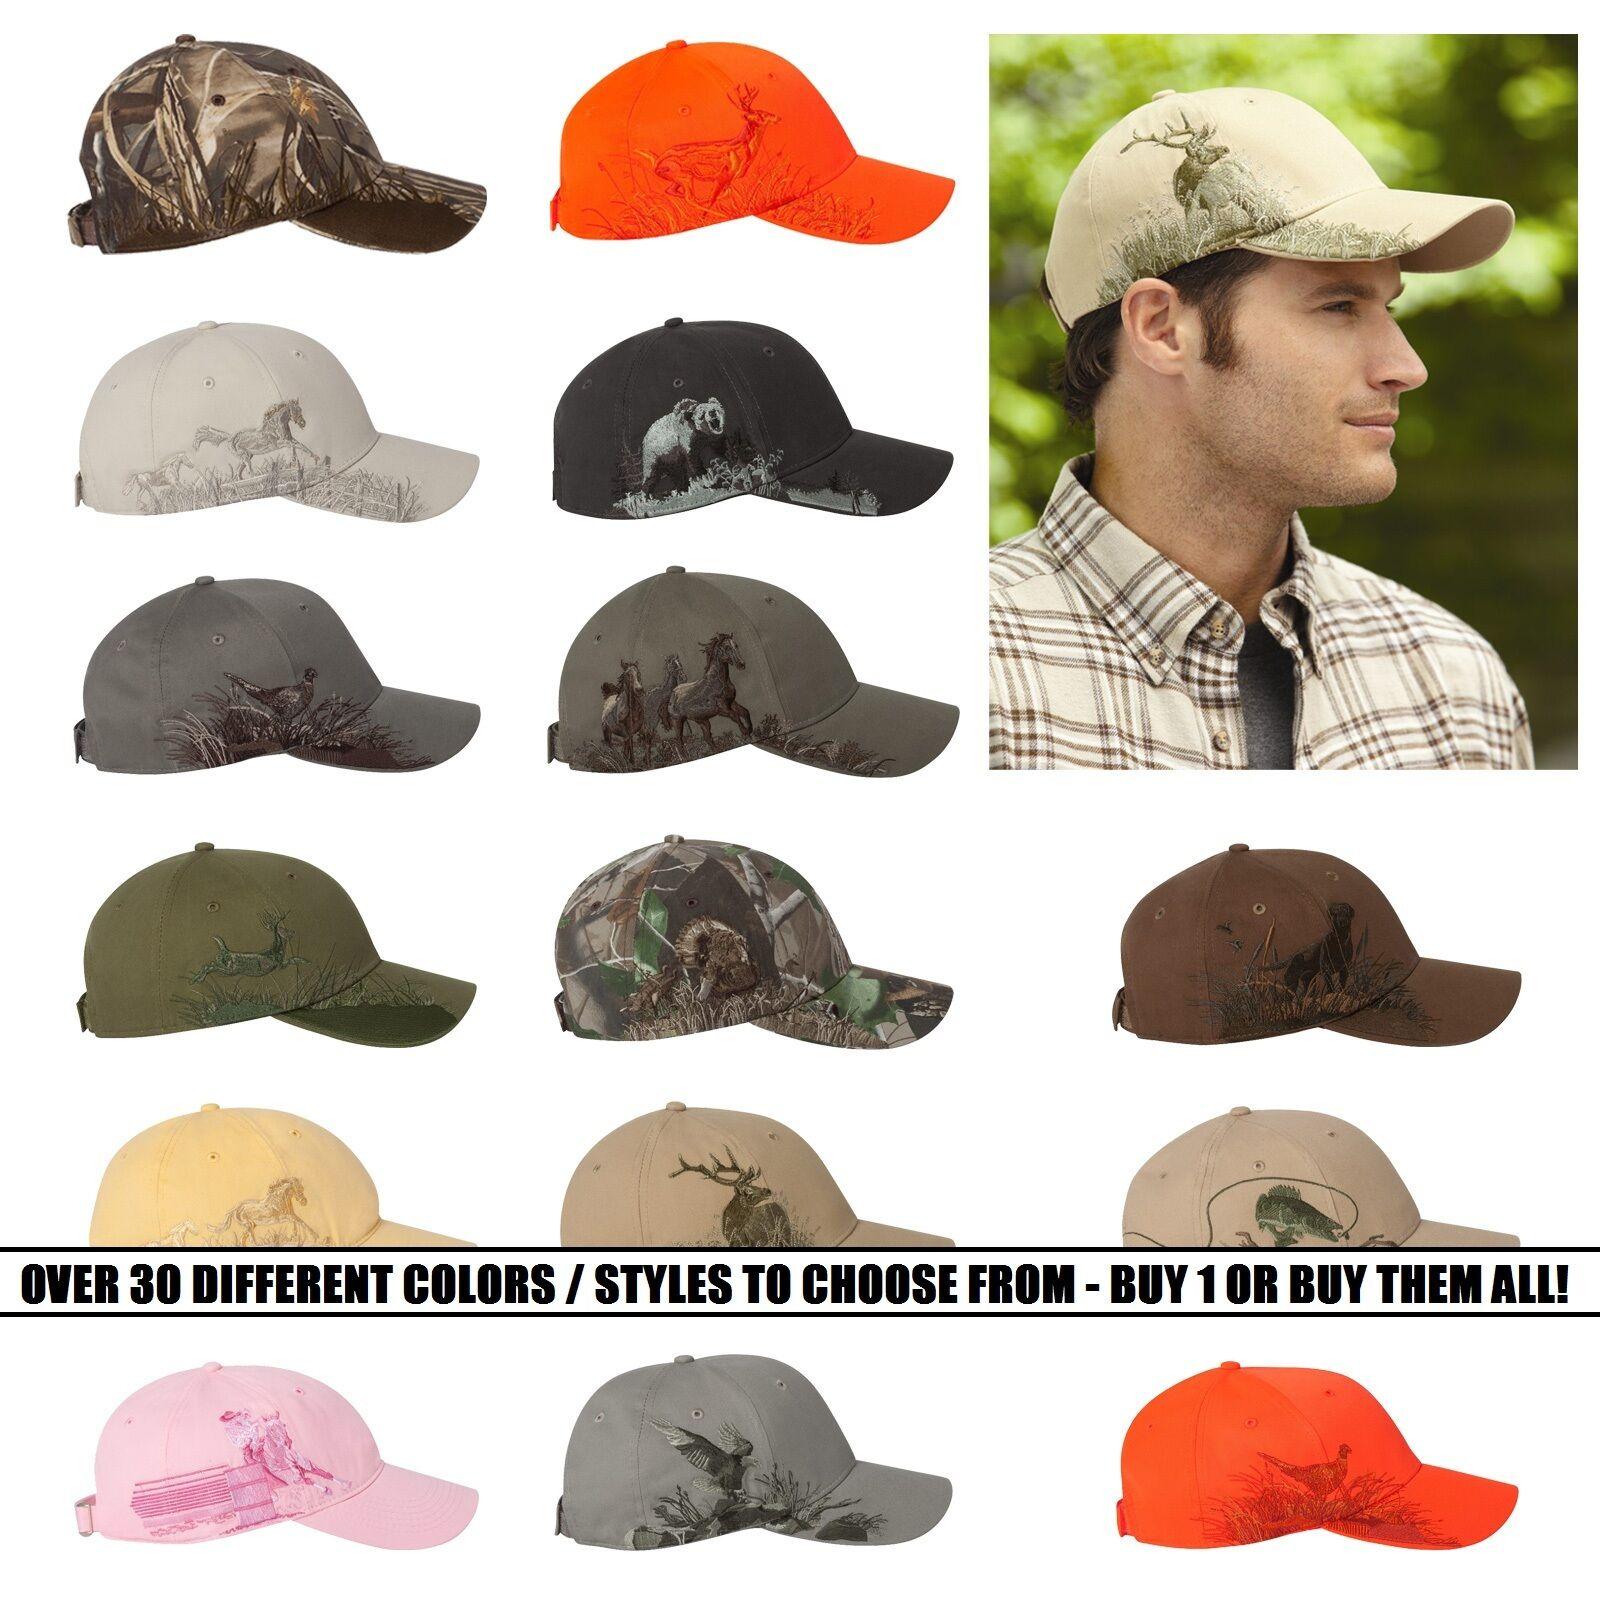 DRI DUCK - Men's, Unisex, Outdoor, Wildlife Series Hunting C